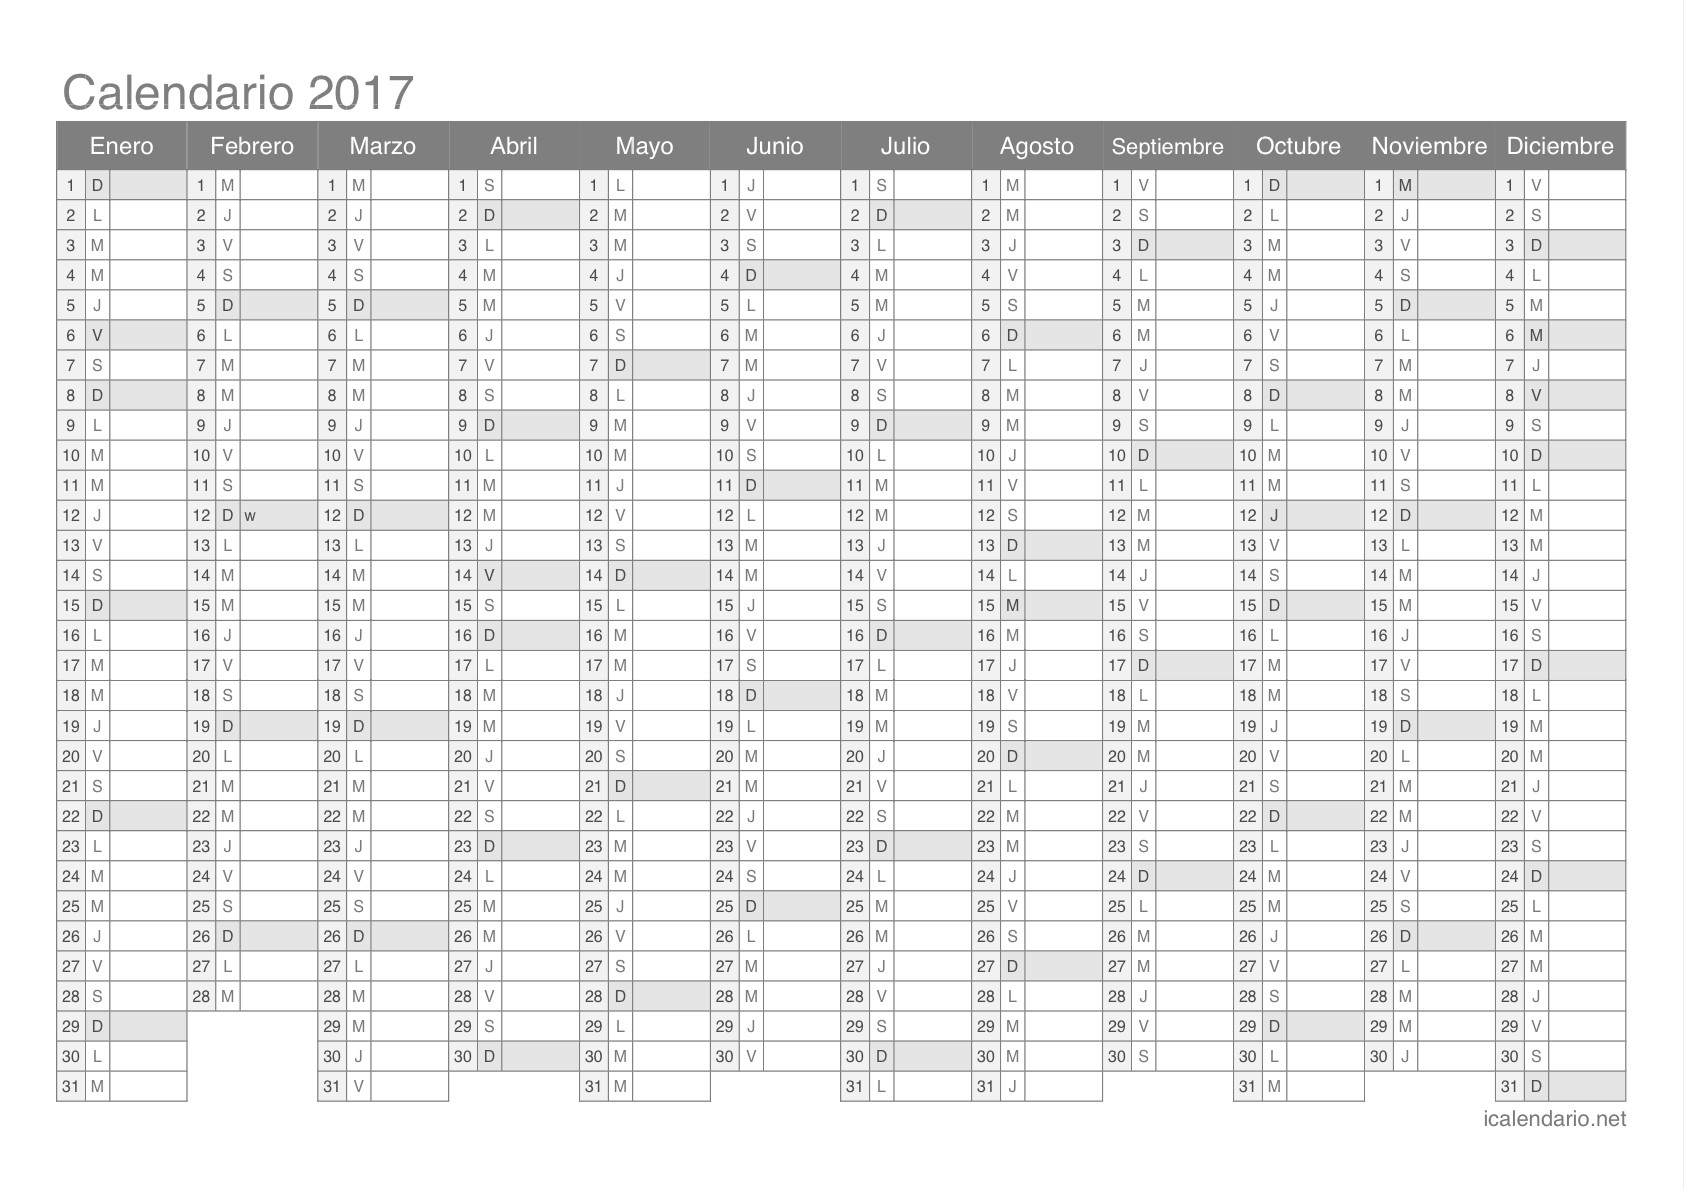 Calendario Para Imprimir Noviembre 2017 Chile Más Actual 2019 2018 Calendar Printable with Holidays List Kalender Kalendar Of Calendario Para Imprimir Noviembre 2017 Chile Más Recientes Imprimir Calendario Mes A Mes top Calendario Para Imprimir top